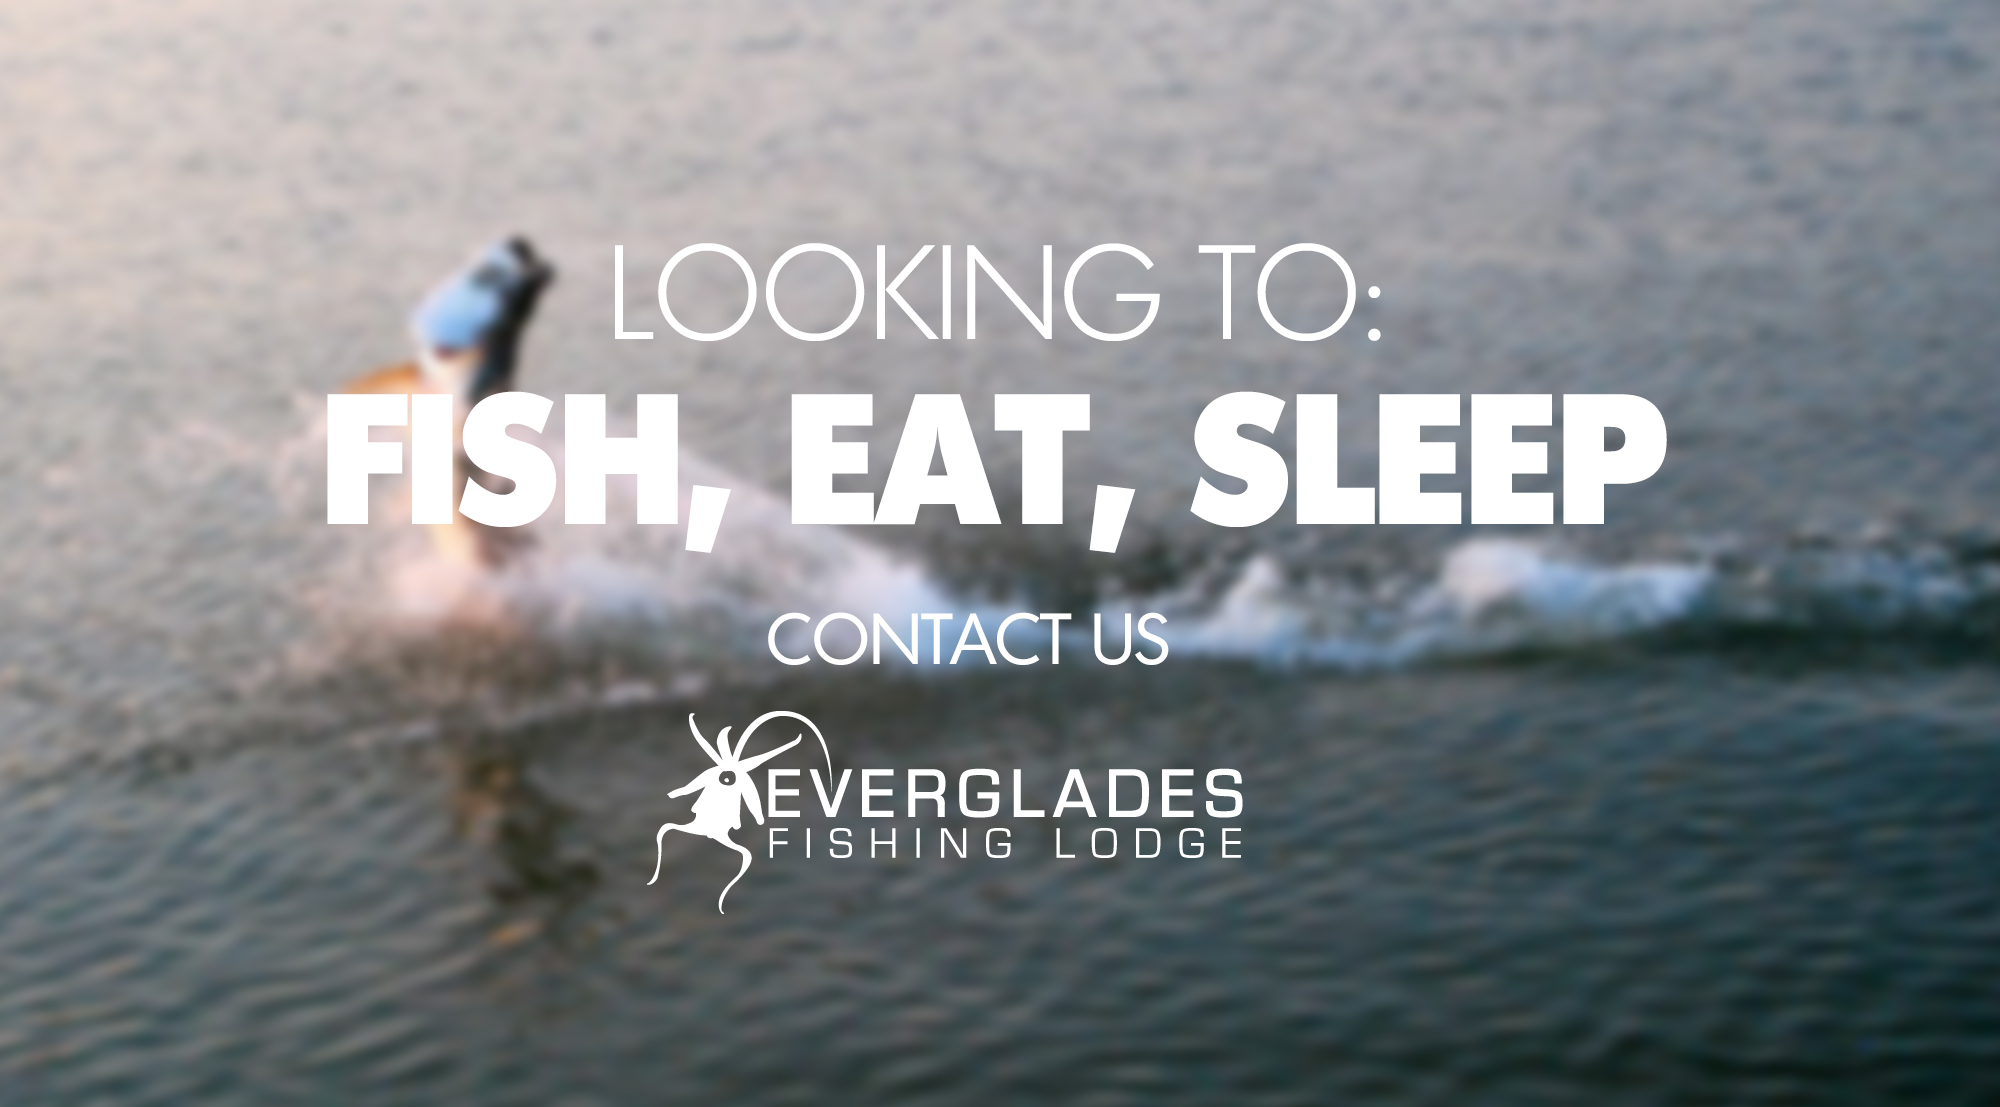 fish-eat-sleep-tarpon.jpg